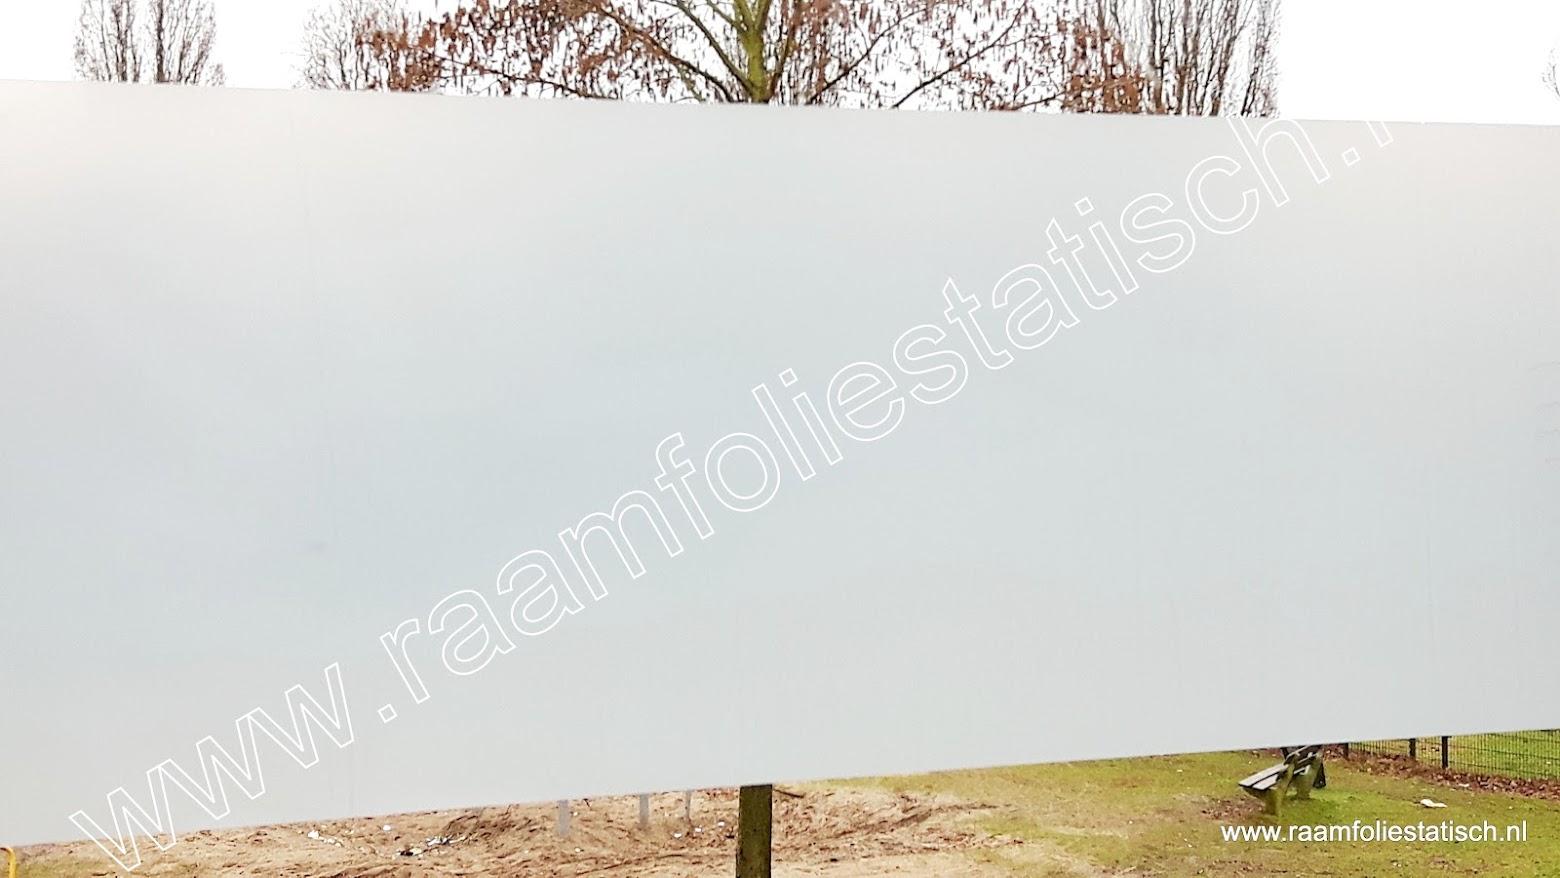 inkijkwerende melkglas folie 90cm d-c-fix